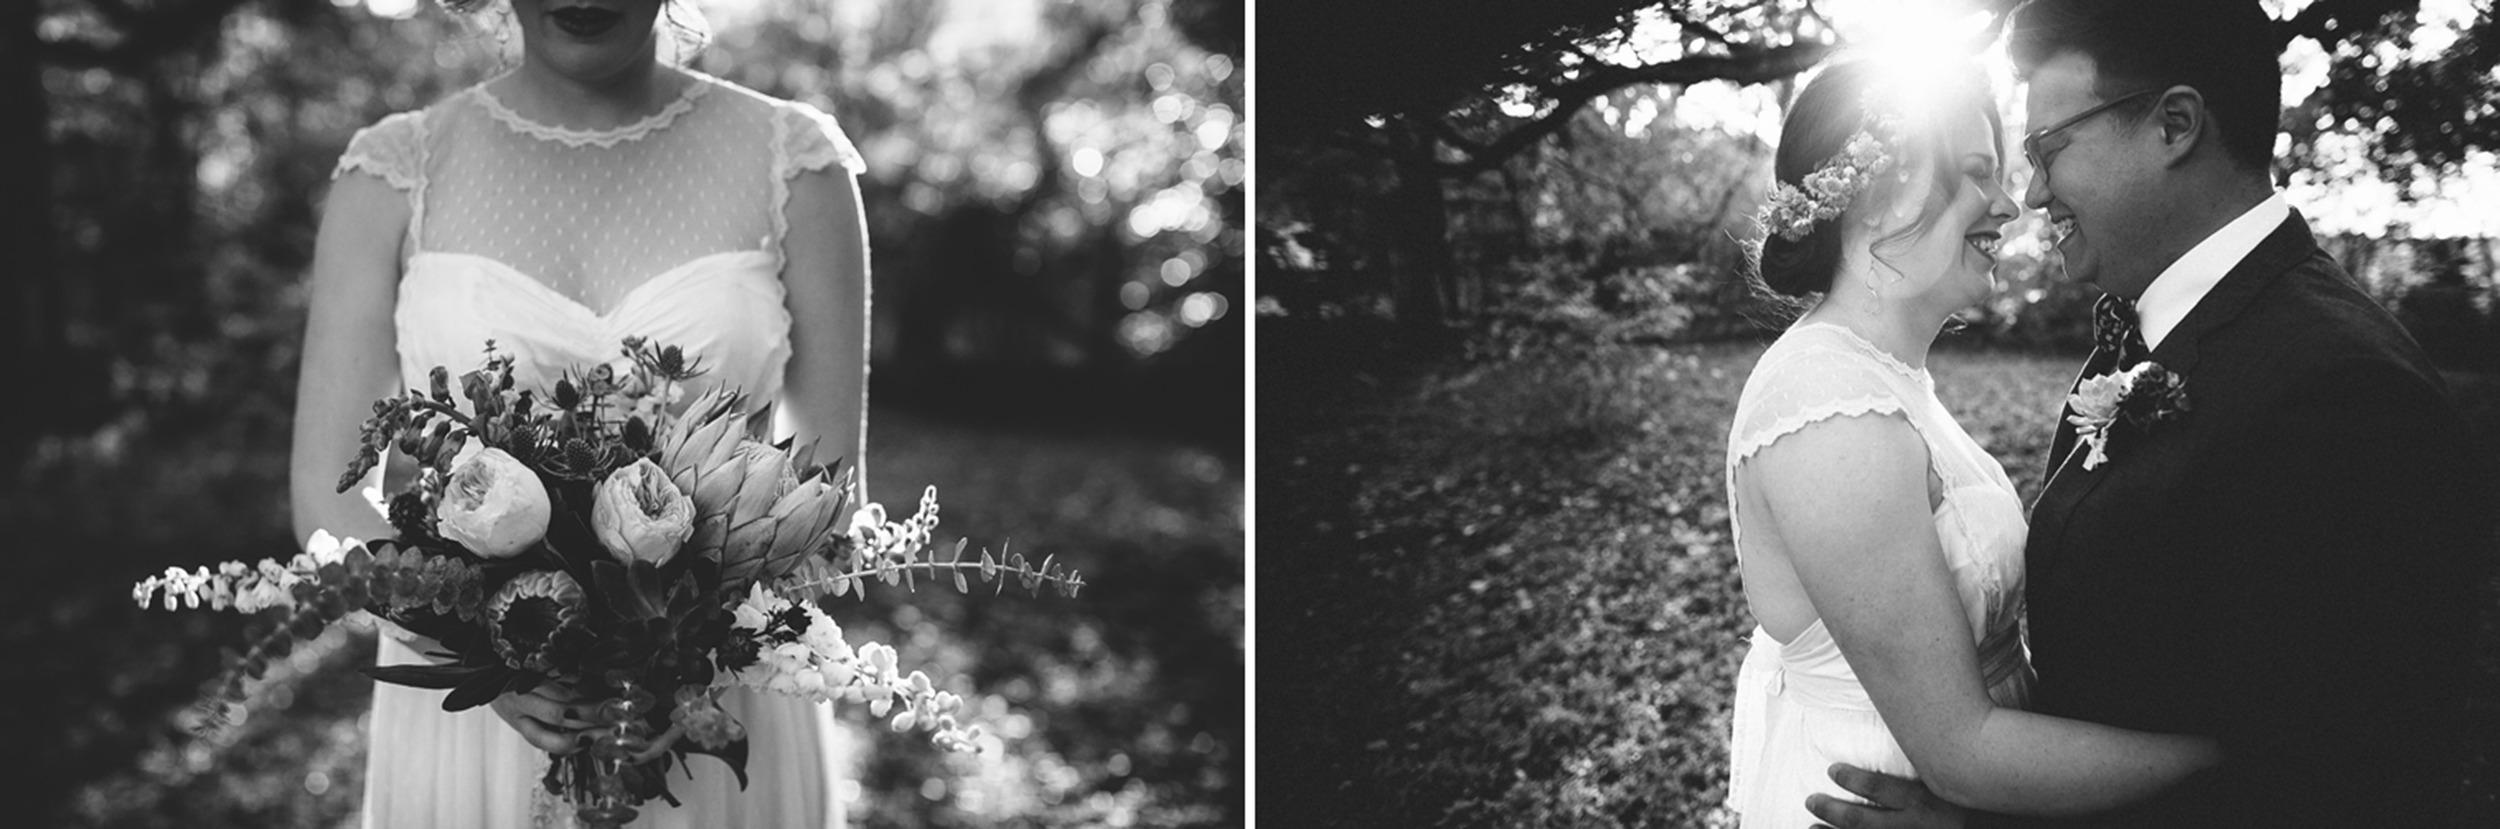 AustinWeddingPhotographer-Mercury-Hall061.jpg